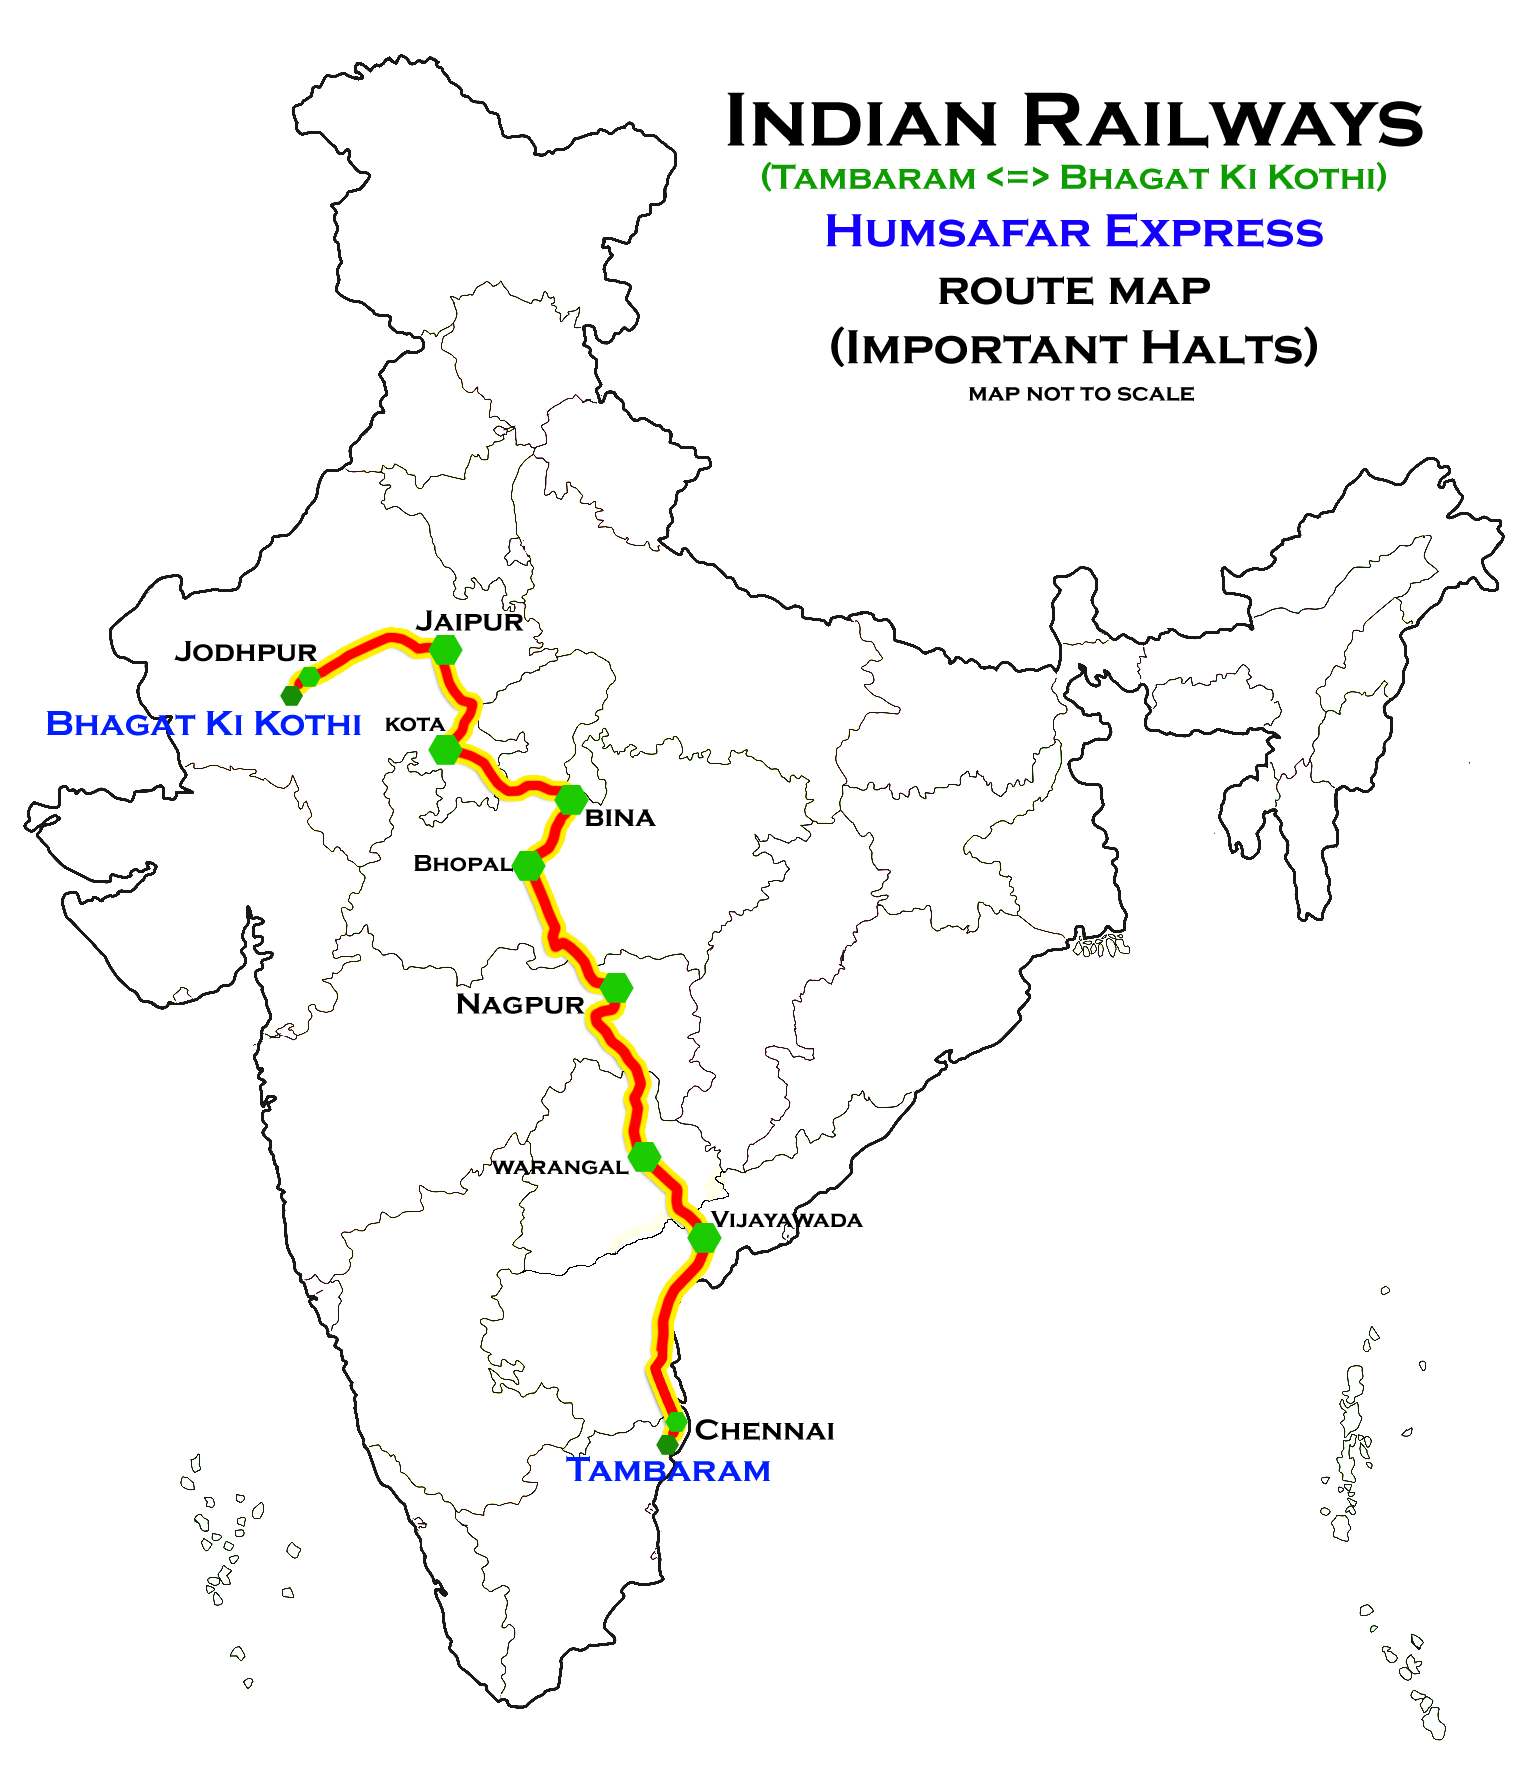 Bhagat Ki Kothi – Tambaram Humsafar Express - Wikipedia